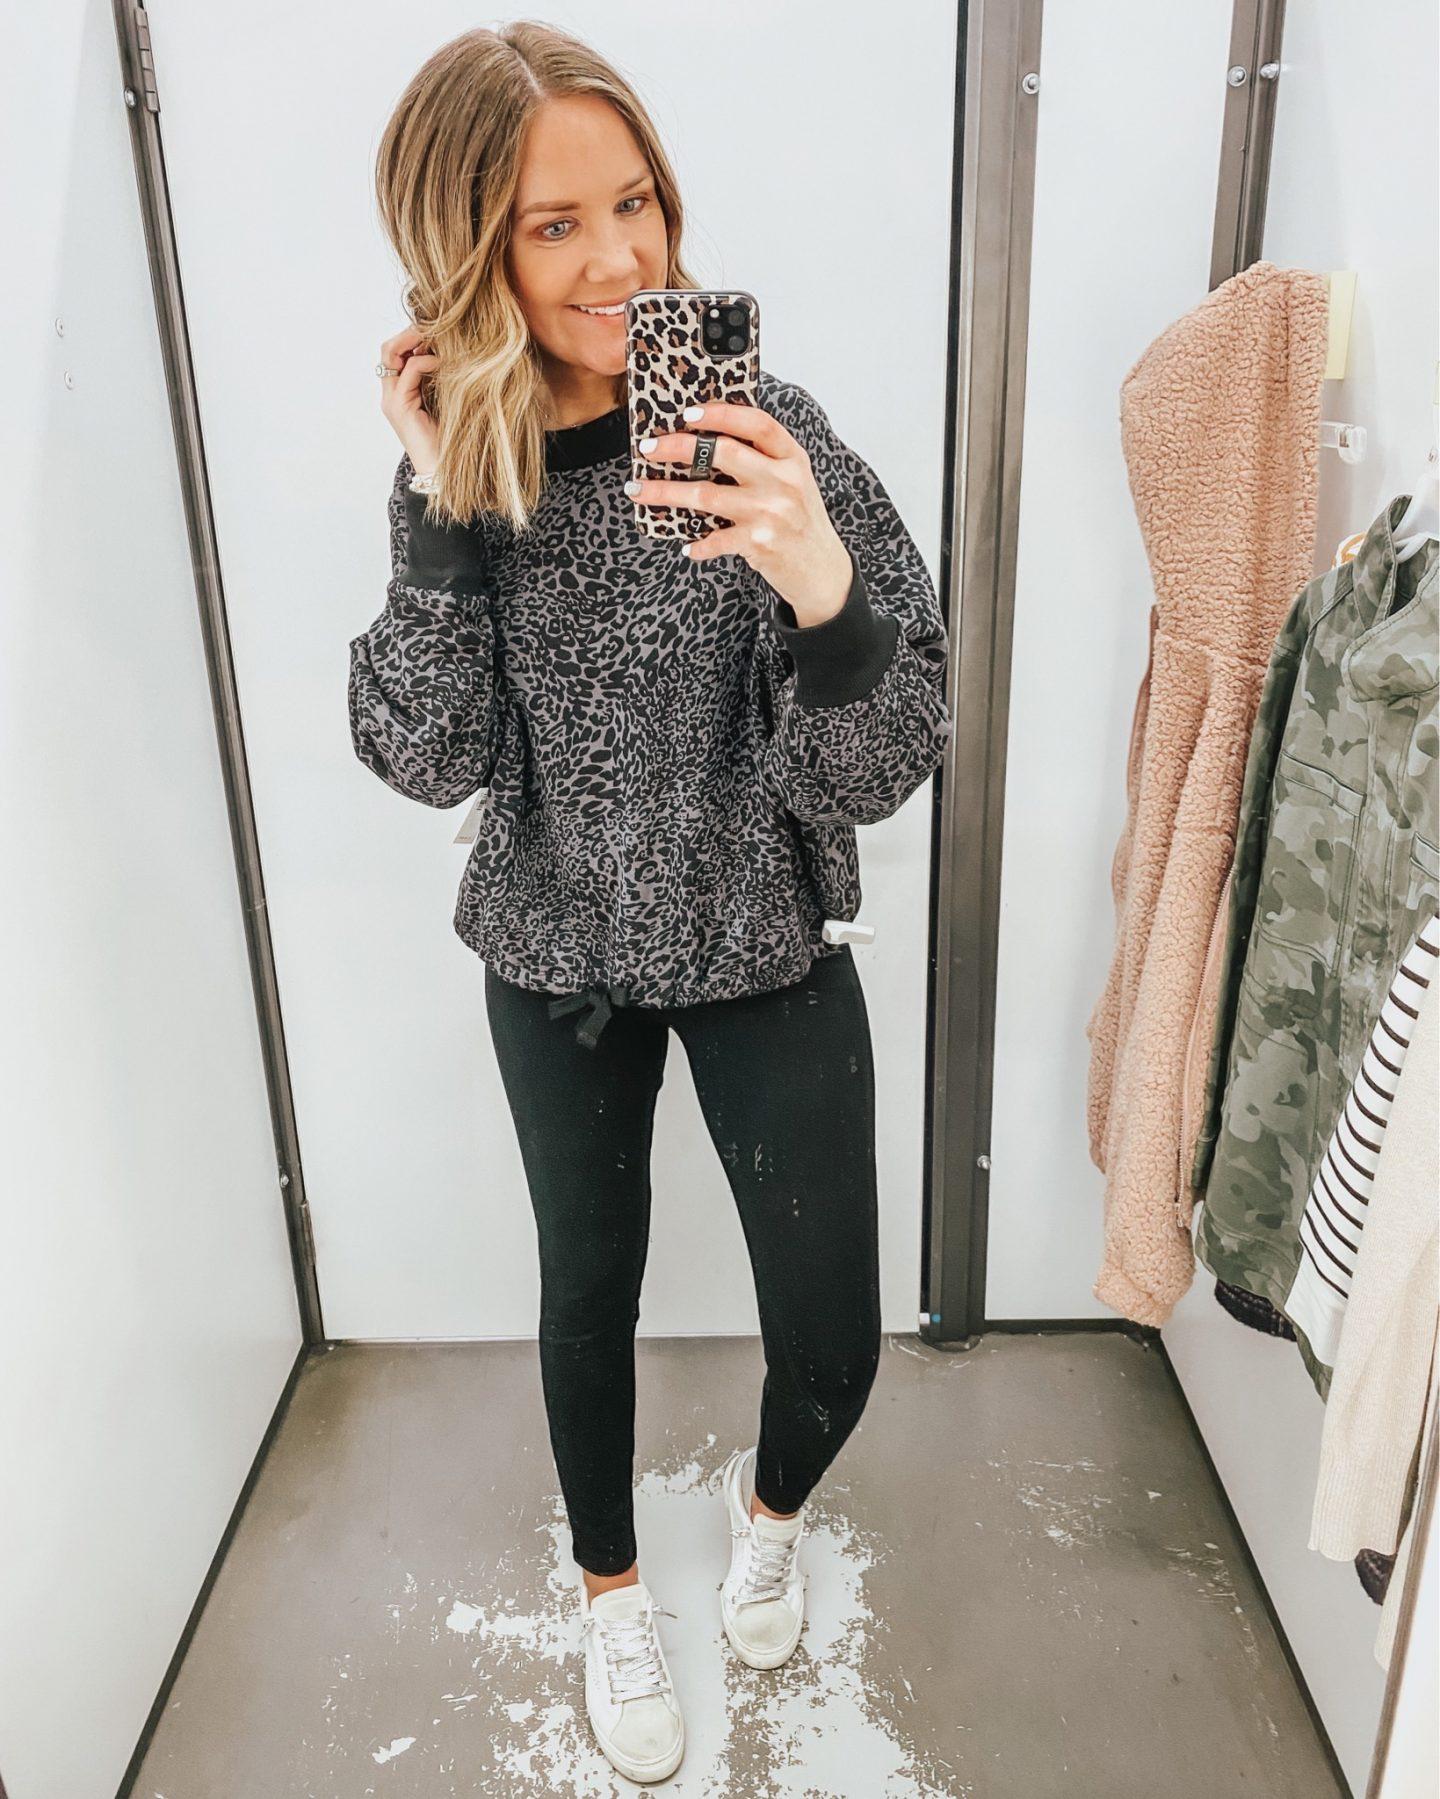 leopard-sweatshirt-athleisure-outfit